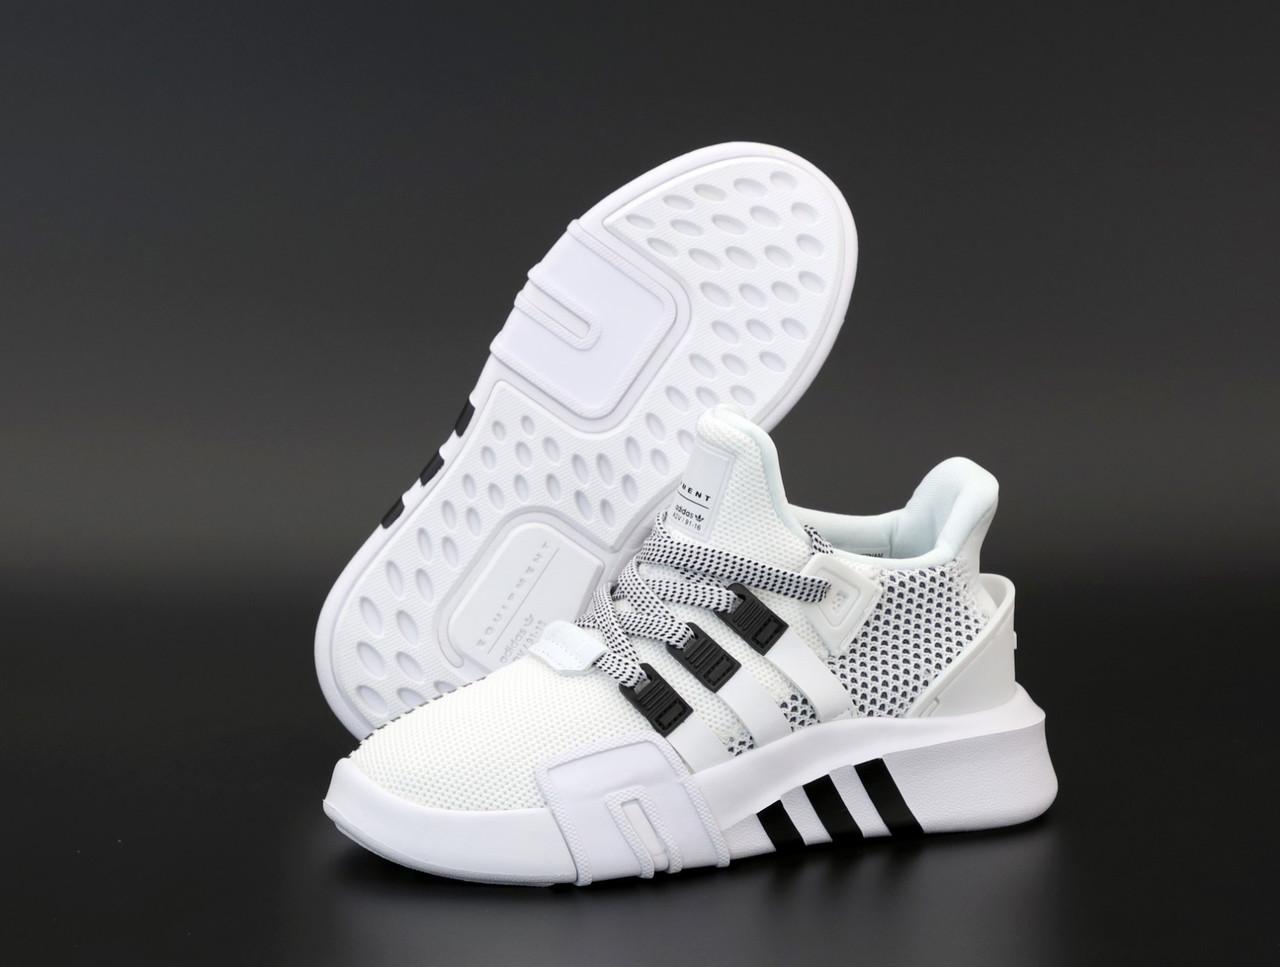 Женские кроссовки Adidas EQT ADV. Белые. ТОП Реплика ААА класса.